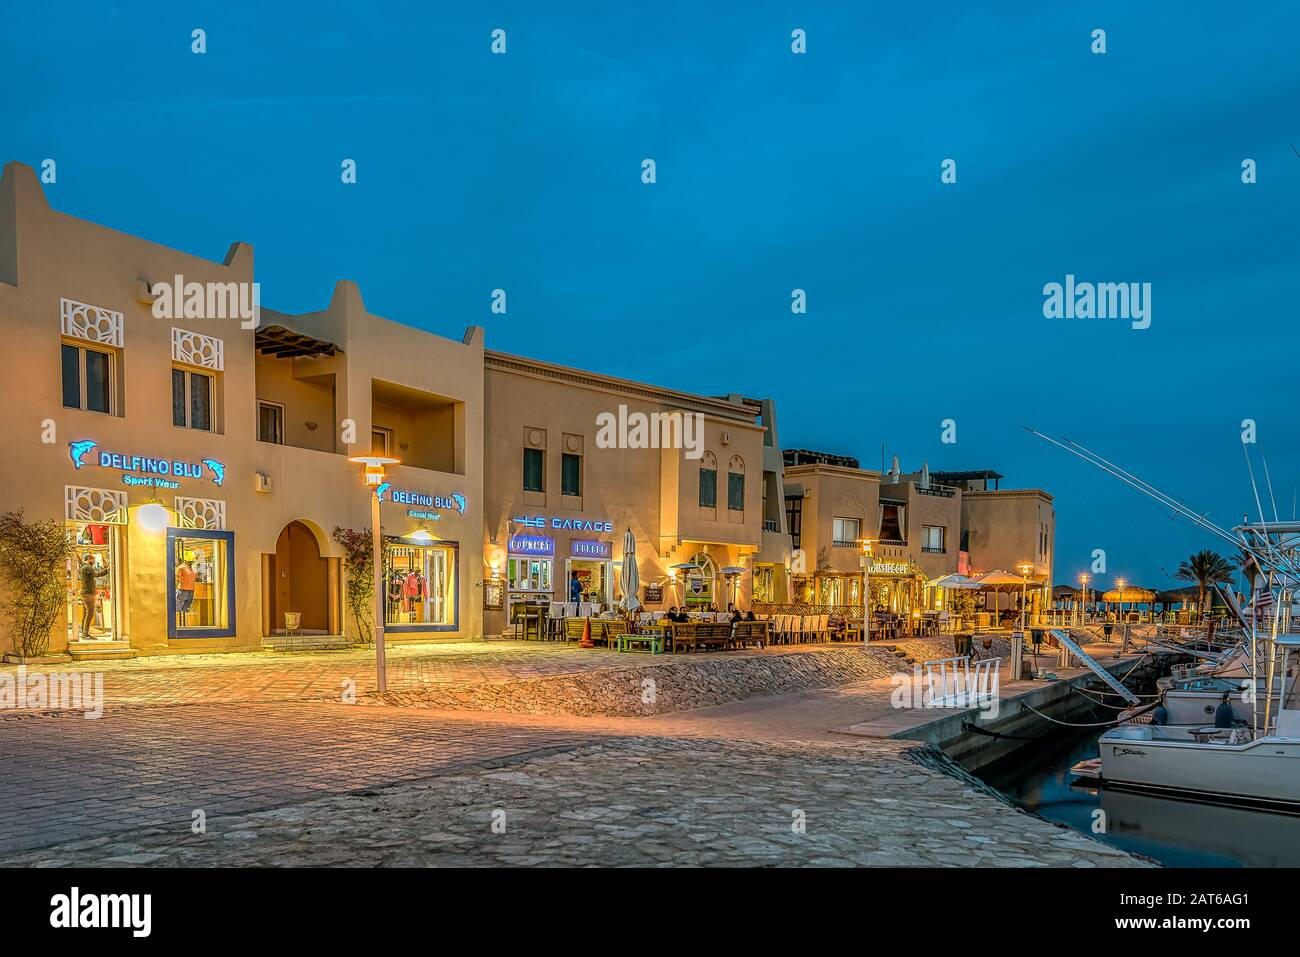 illuminated shopfronts lying on the promade along the Abu Tig marina in el Gouna, Egypt, January 14, 2020 Stock Photo